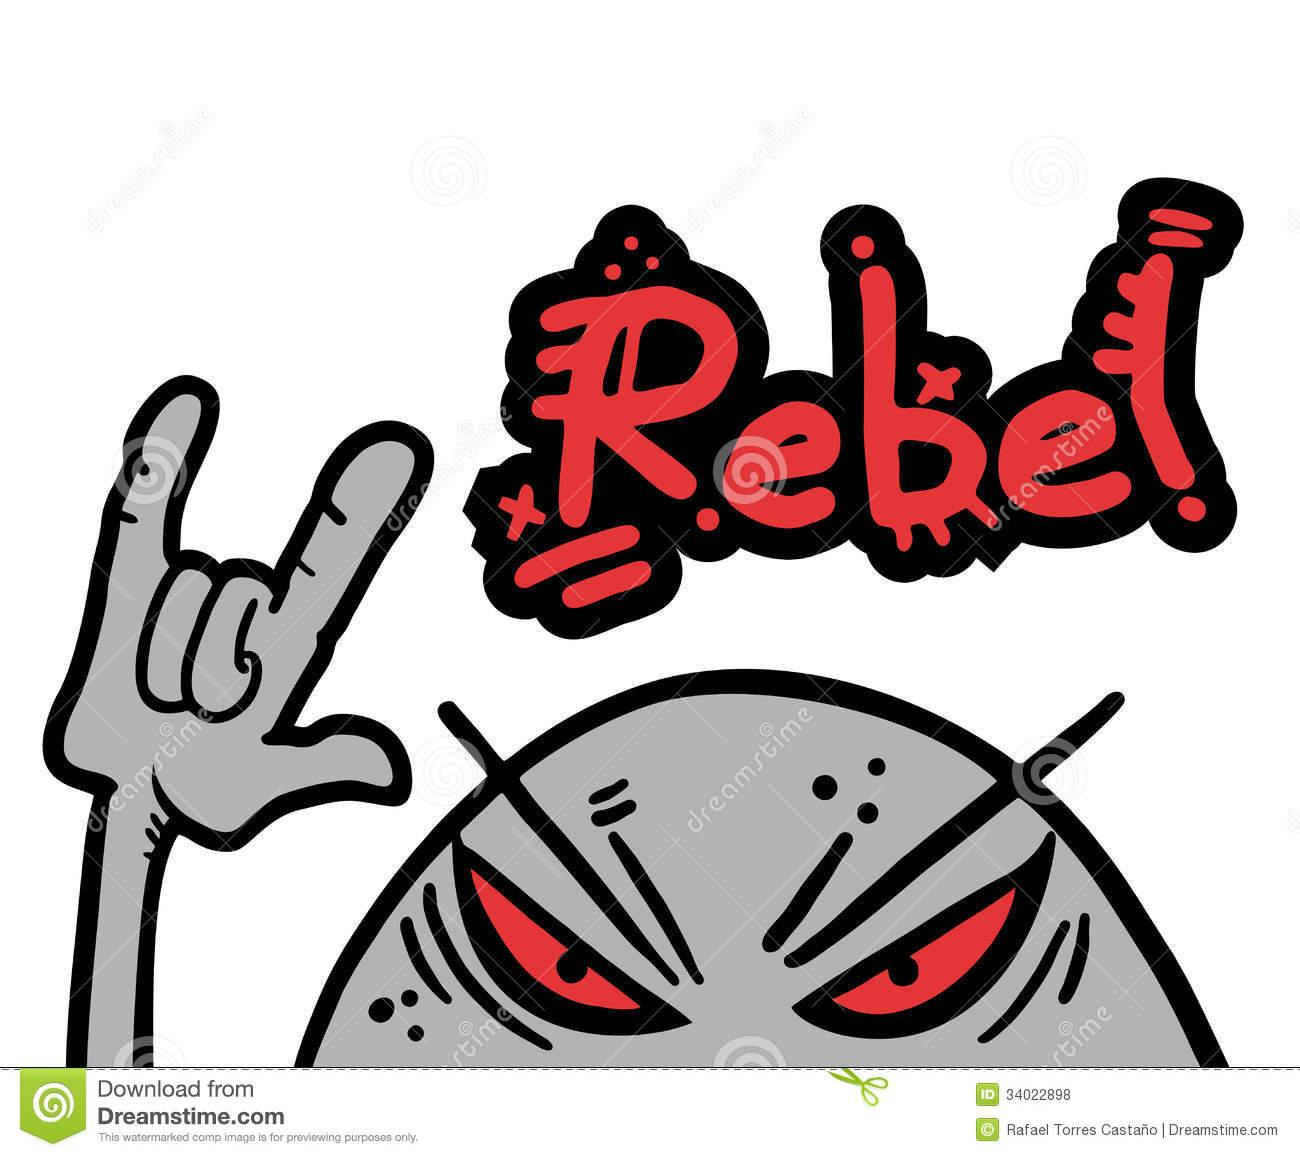 Rebellion clipart 5 » Clipart Station.